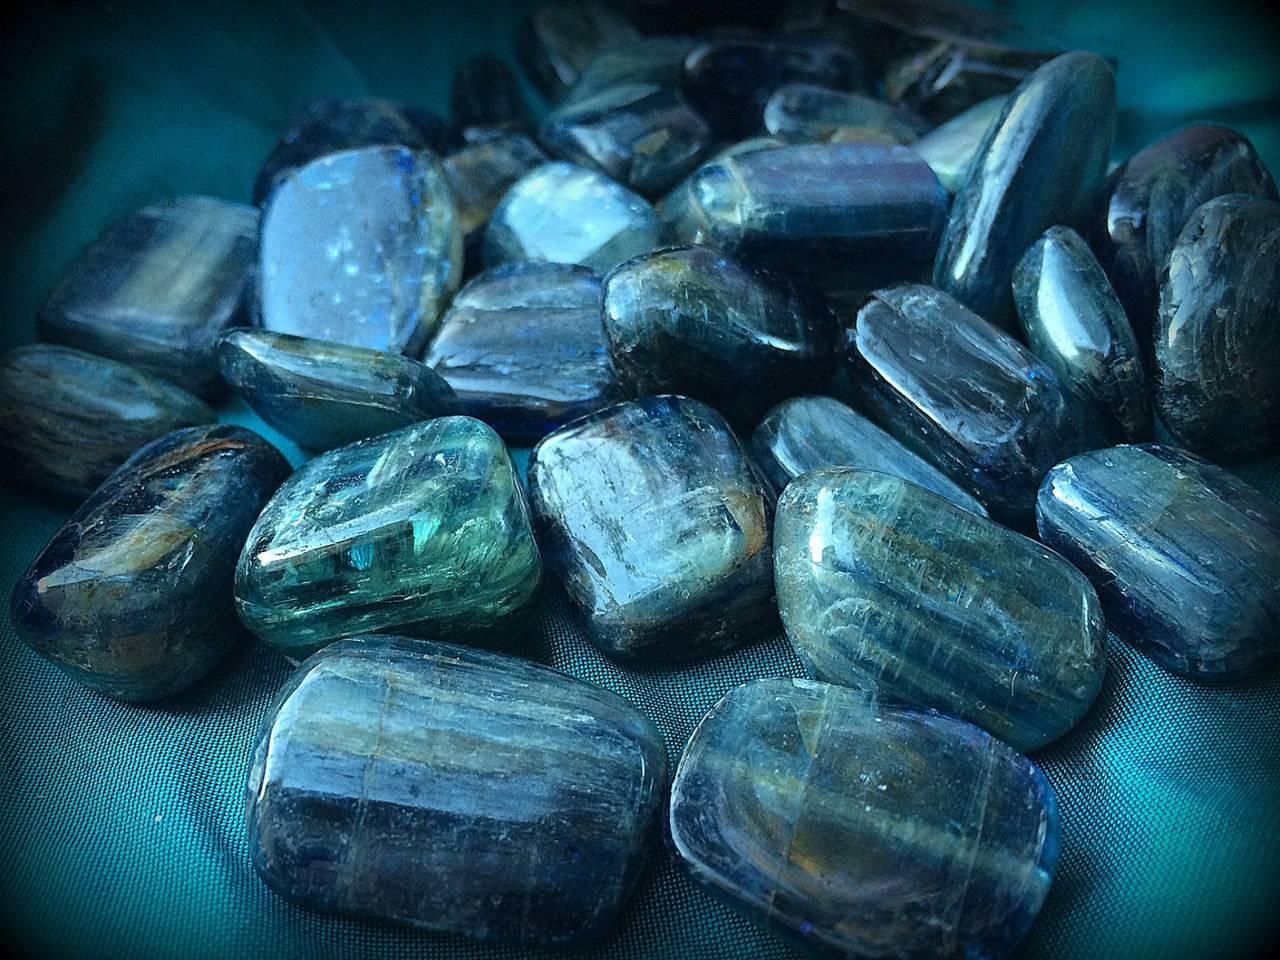 Tumbled Premium Blue Kyanite - The Centering Stone for Alignment & Balance